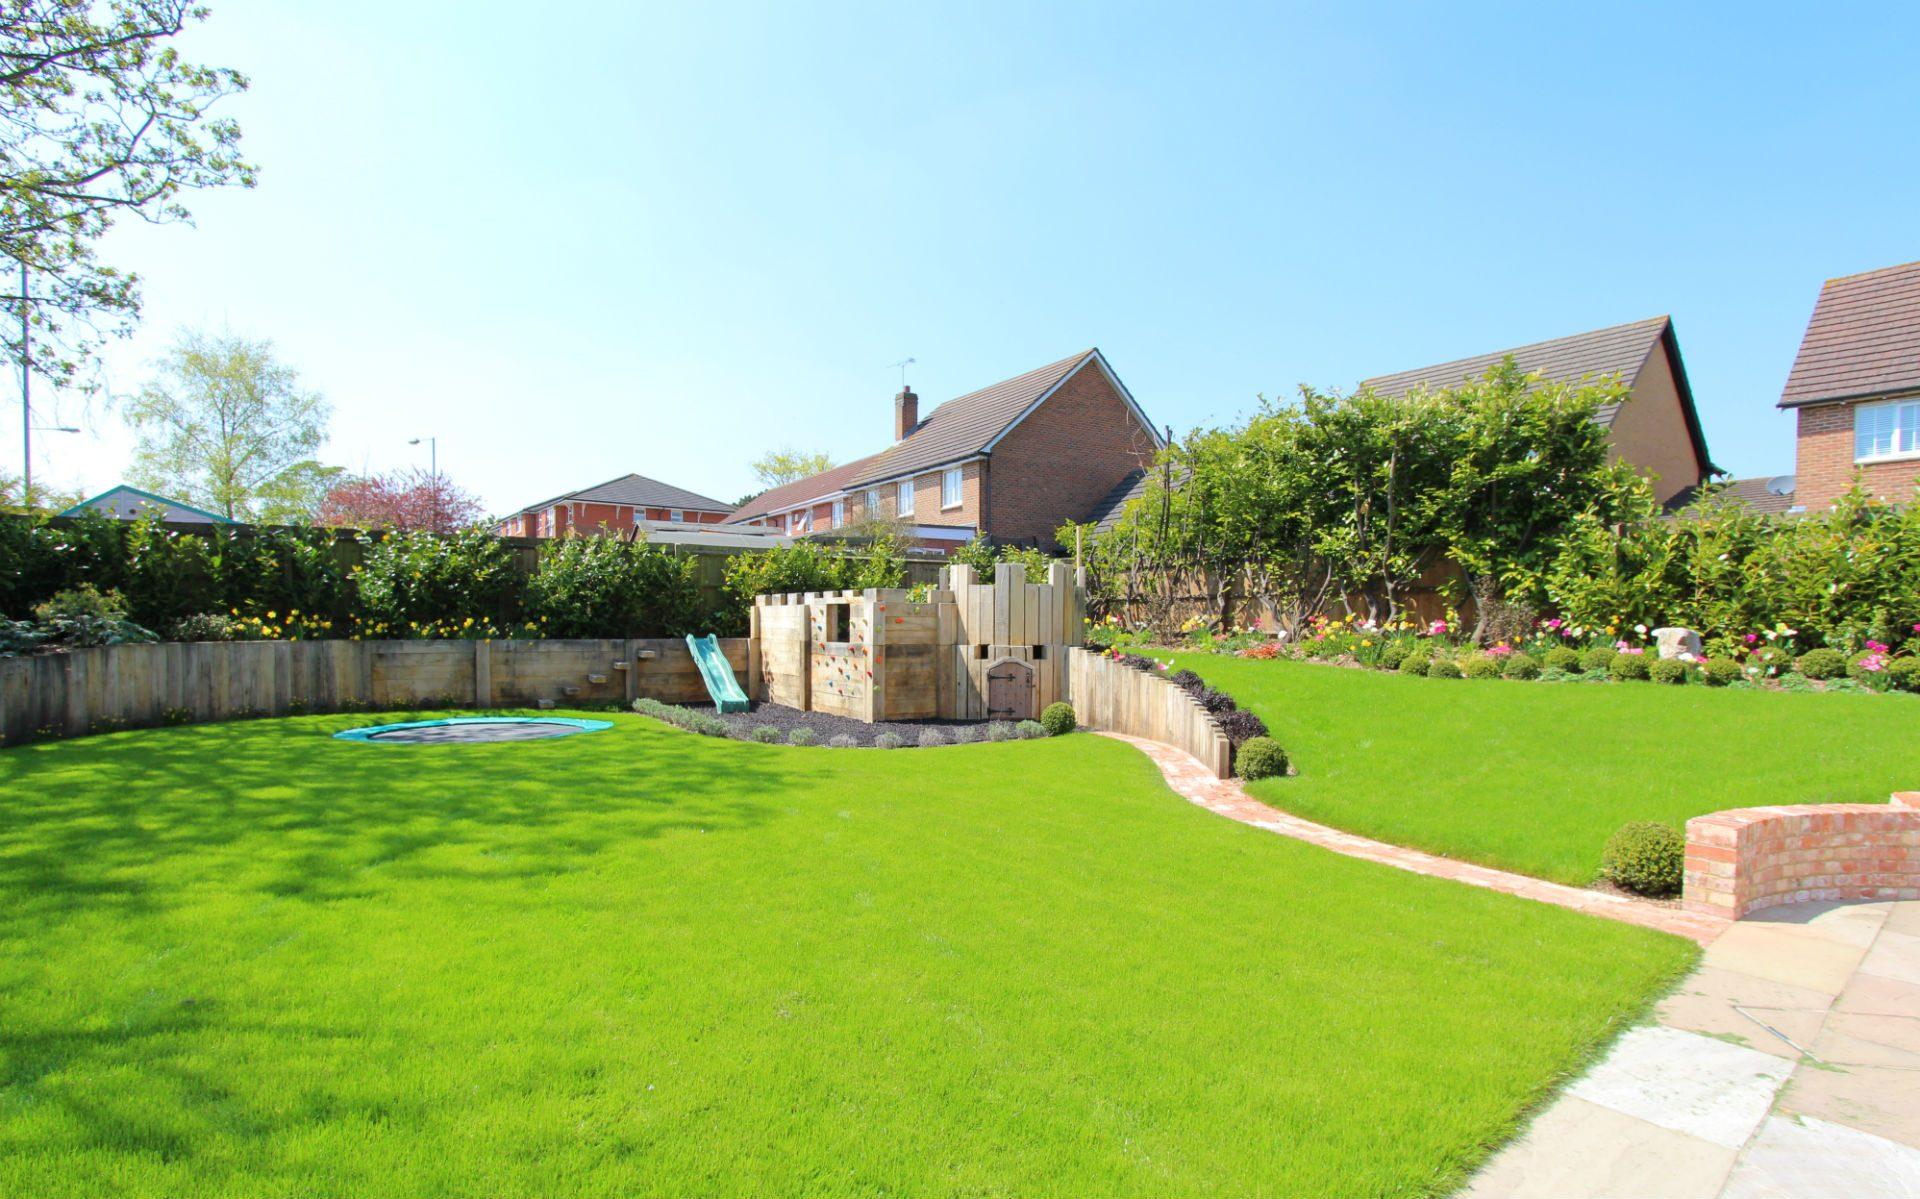 Traditional Cottage Garden Bespoke Oak Fort Retaining Walls